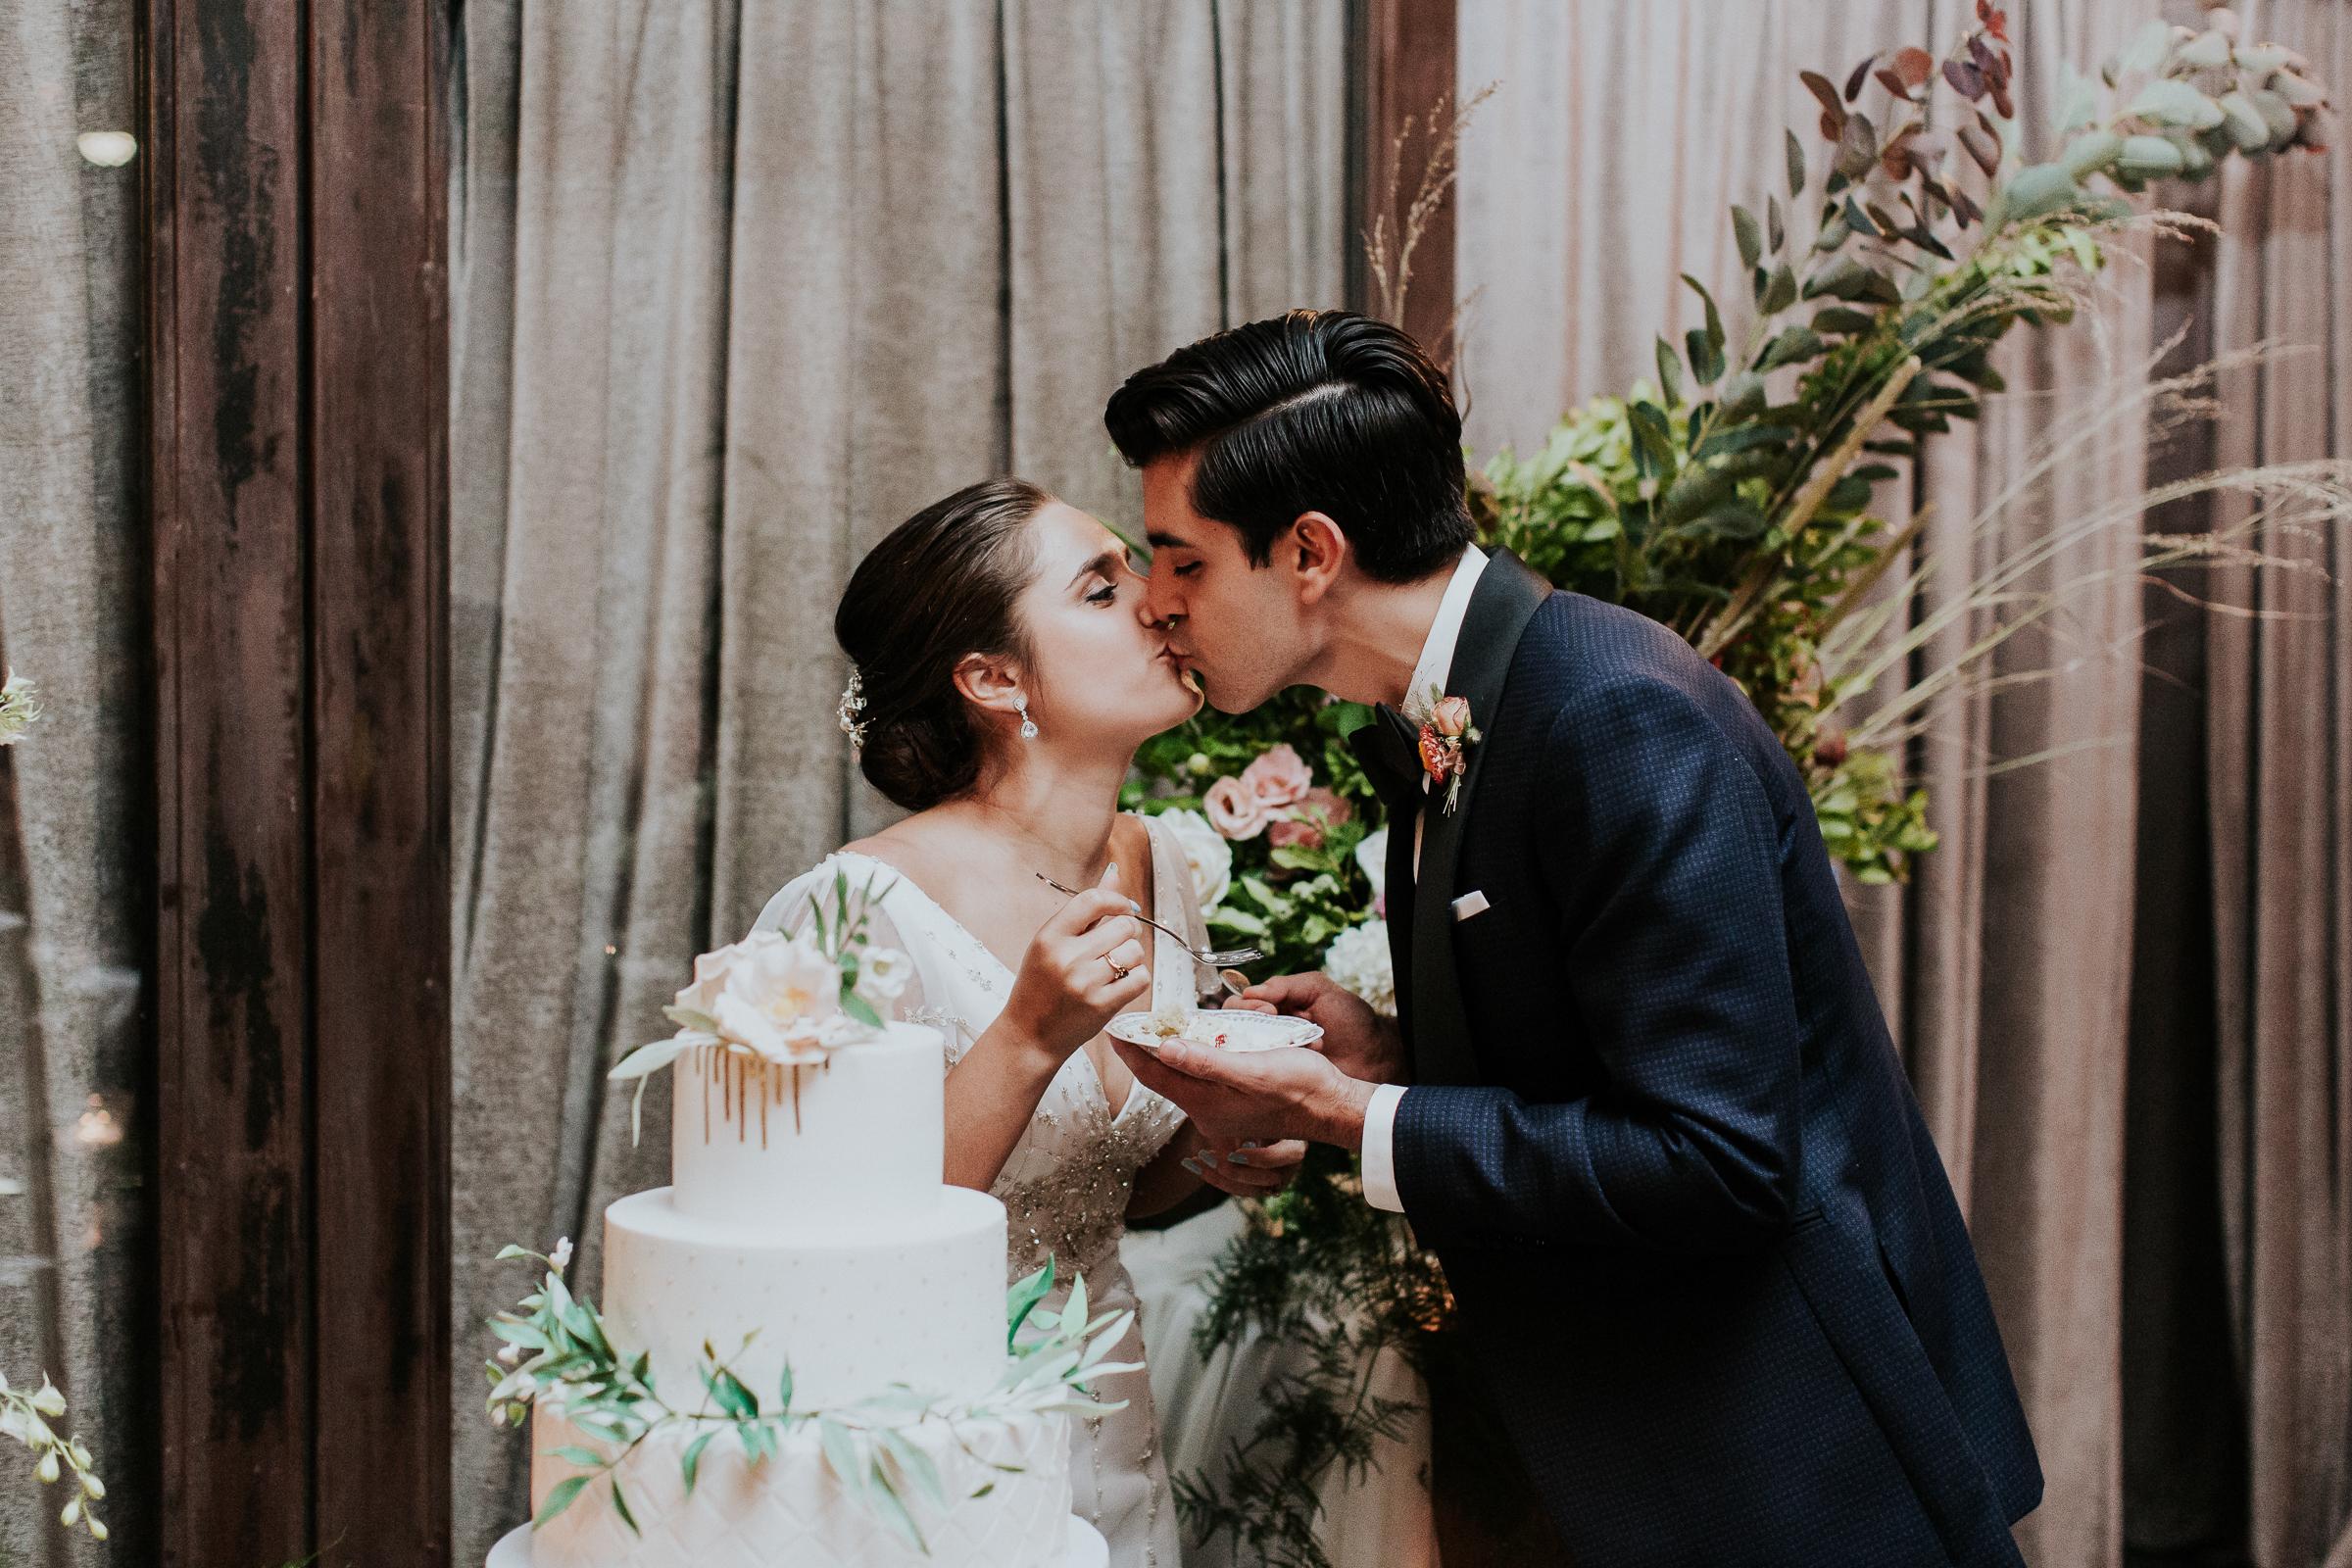 Brooklyn-Winery-NYC-Editorial-Documentary-Wedding-Photographer-Gina-Oli-98.jpg